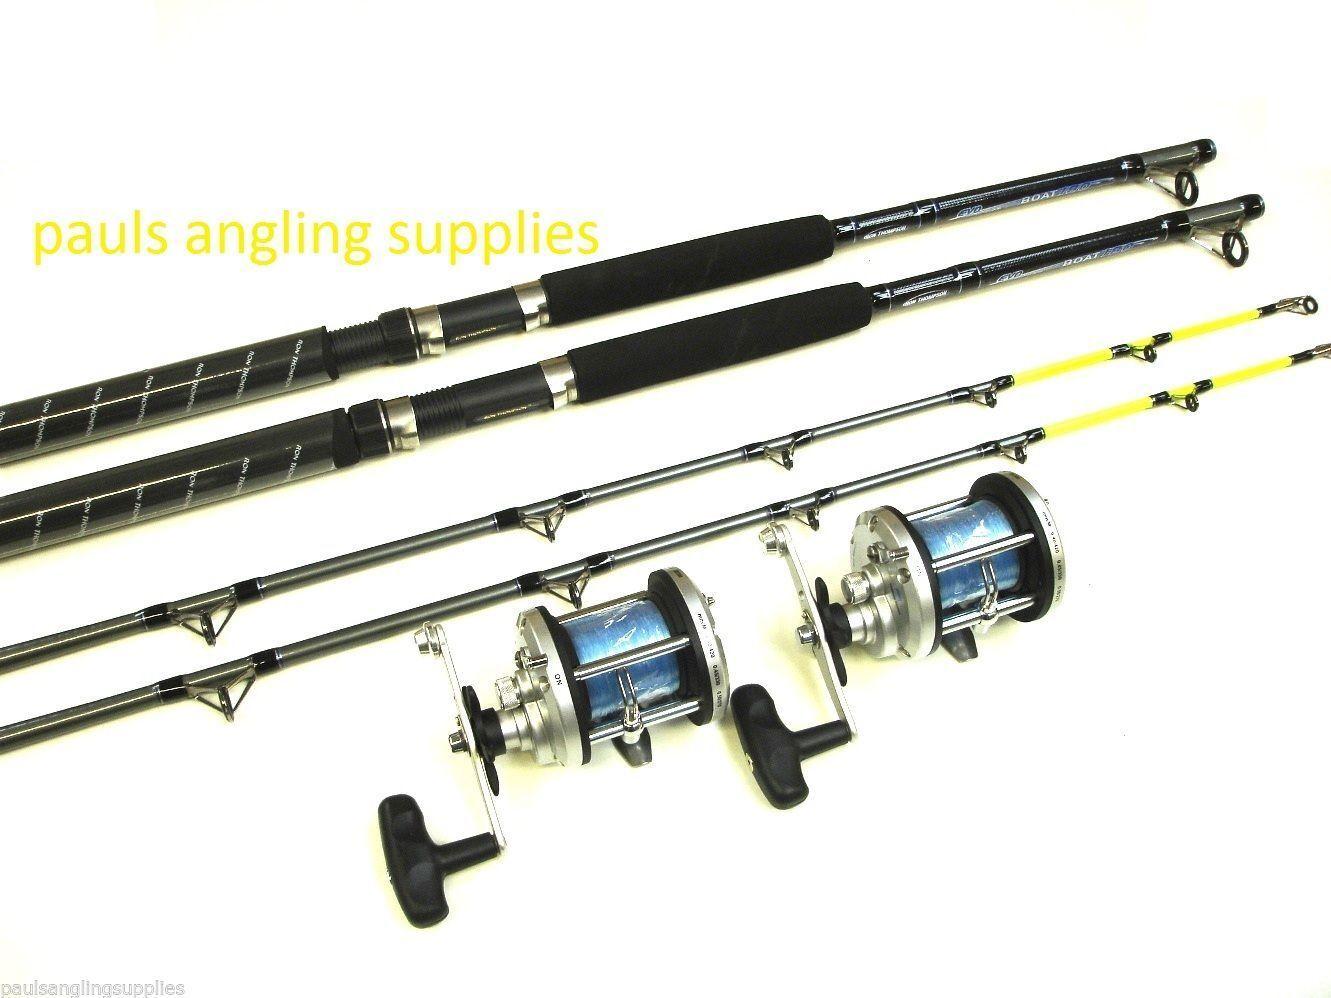 2  x Evo Concept 7 ft Boat  Fishing Rods & JD 500  Multiplier Reels